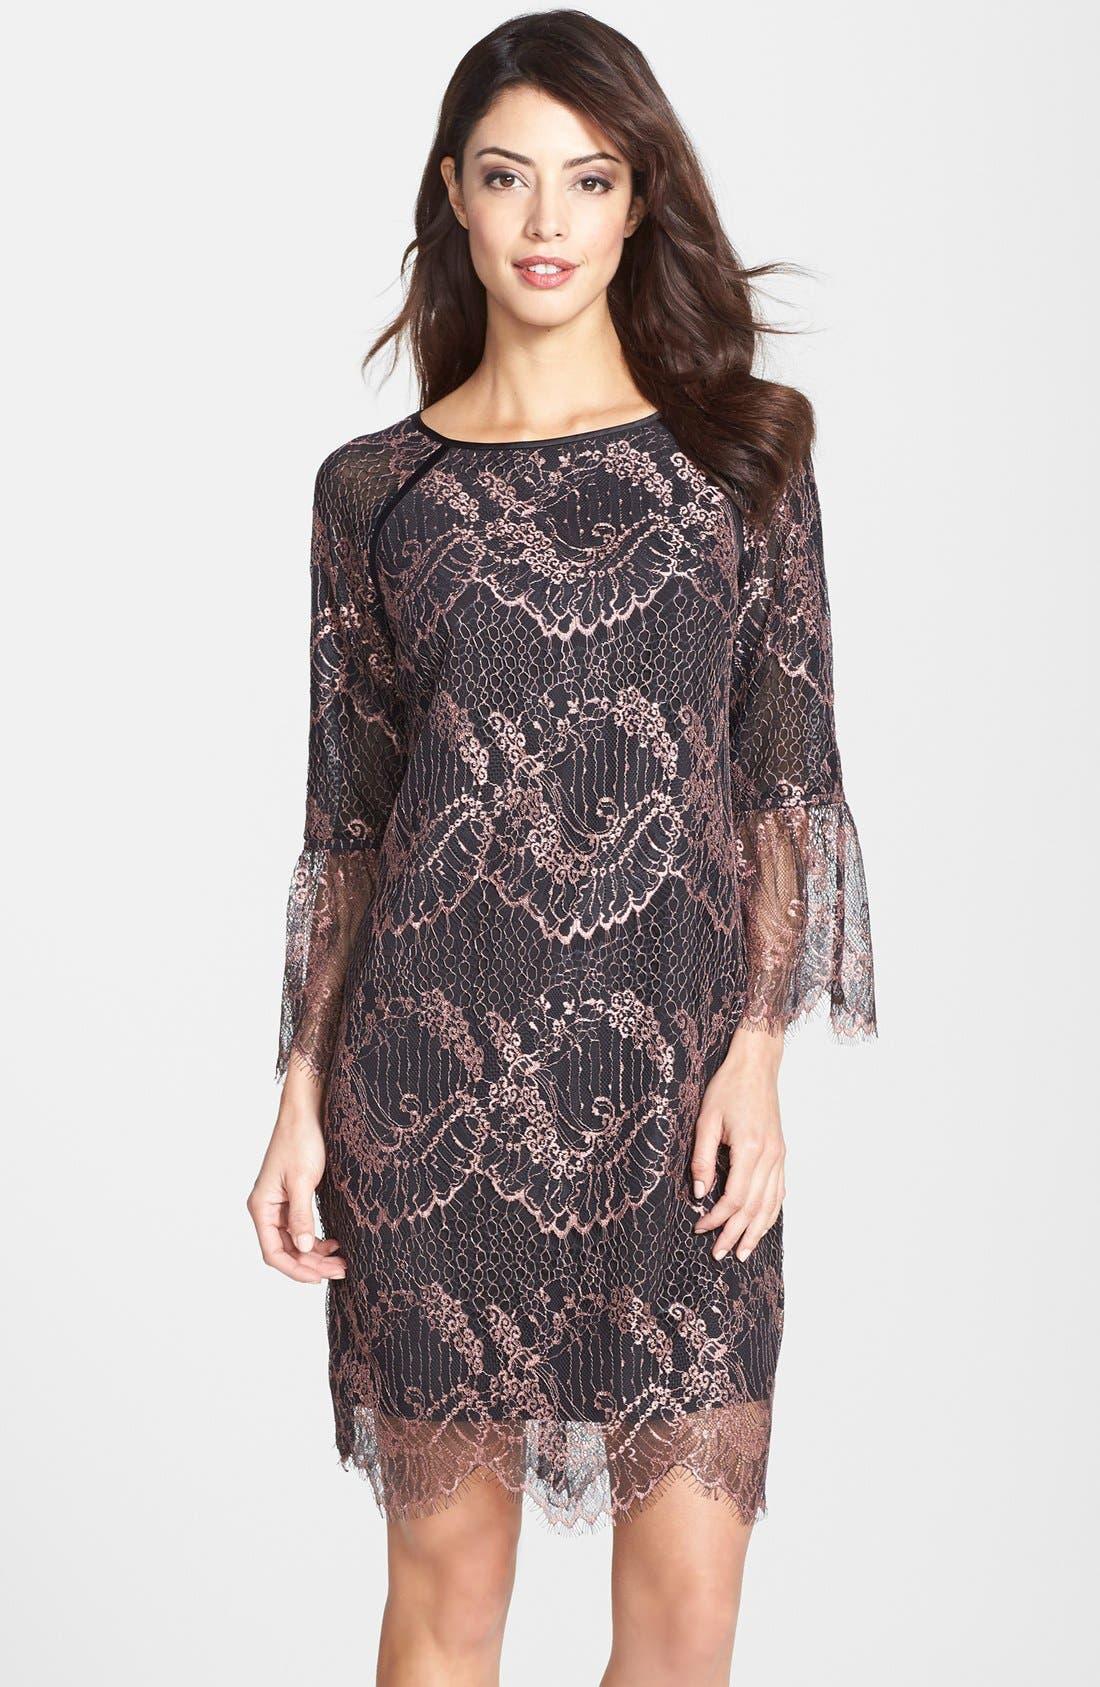 Main Image - Adrianna Papell Metallic Scalloped Lace Shift Dress